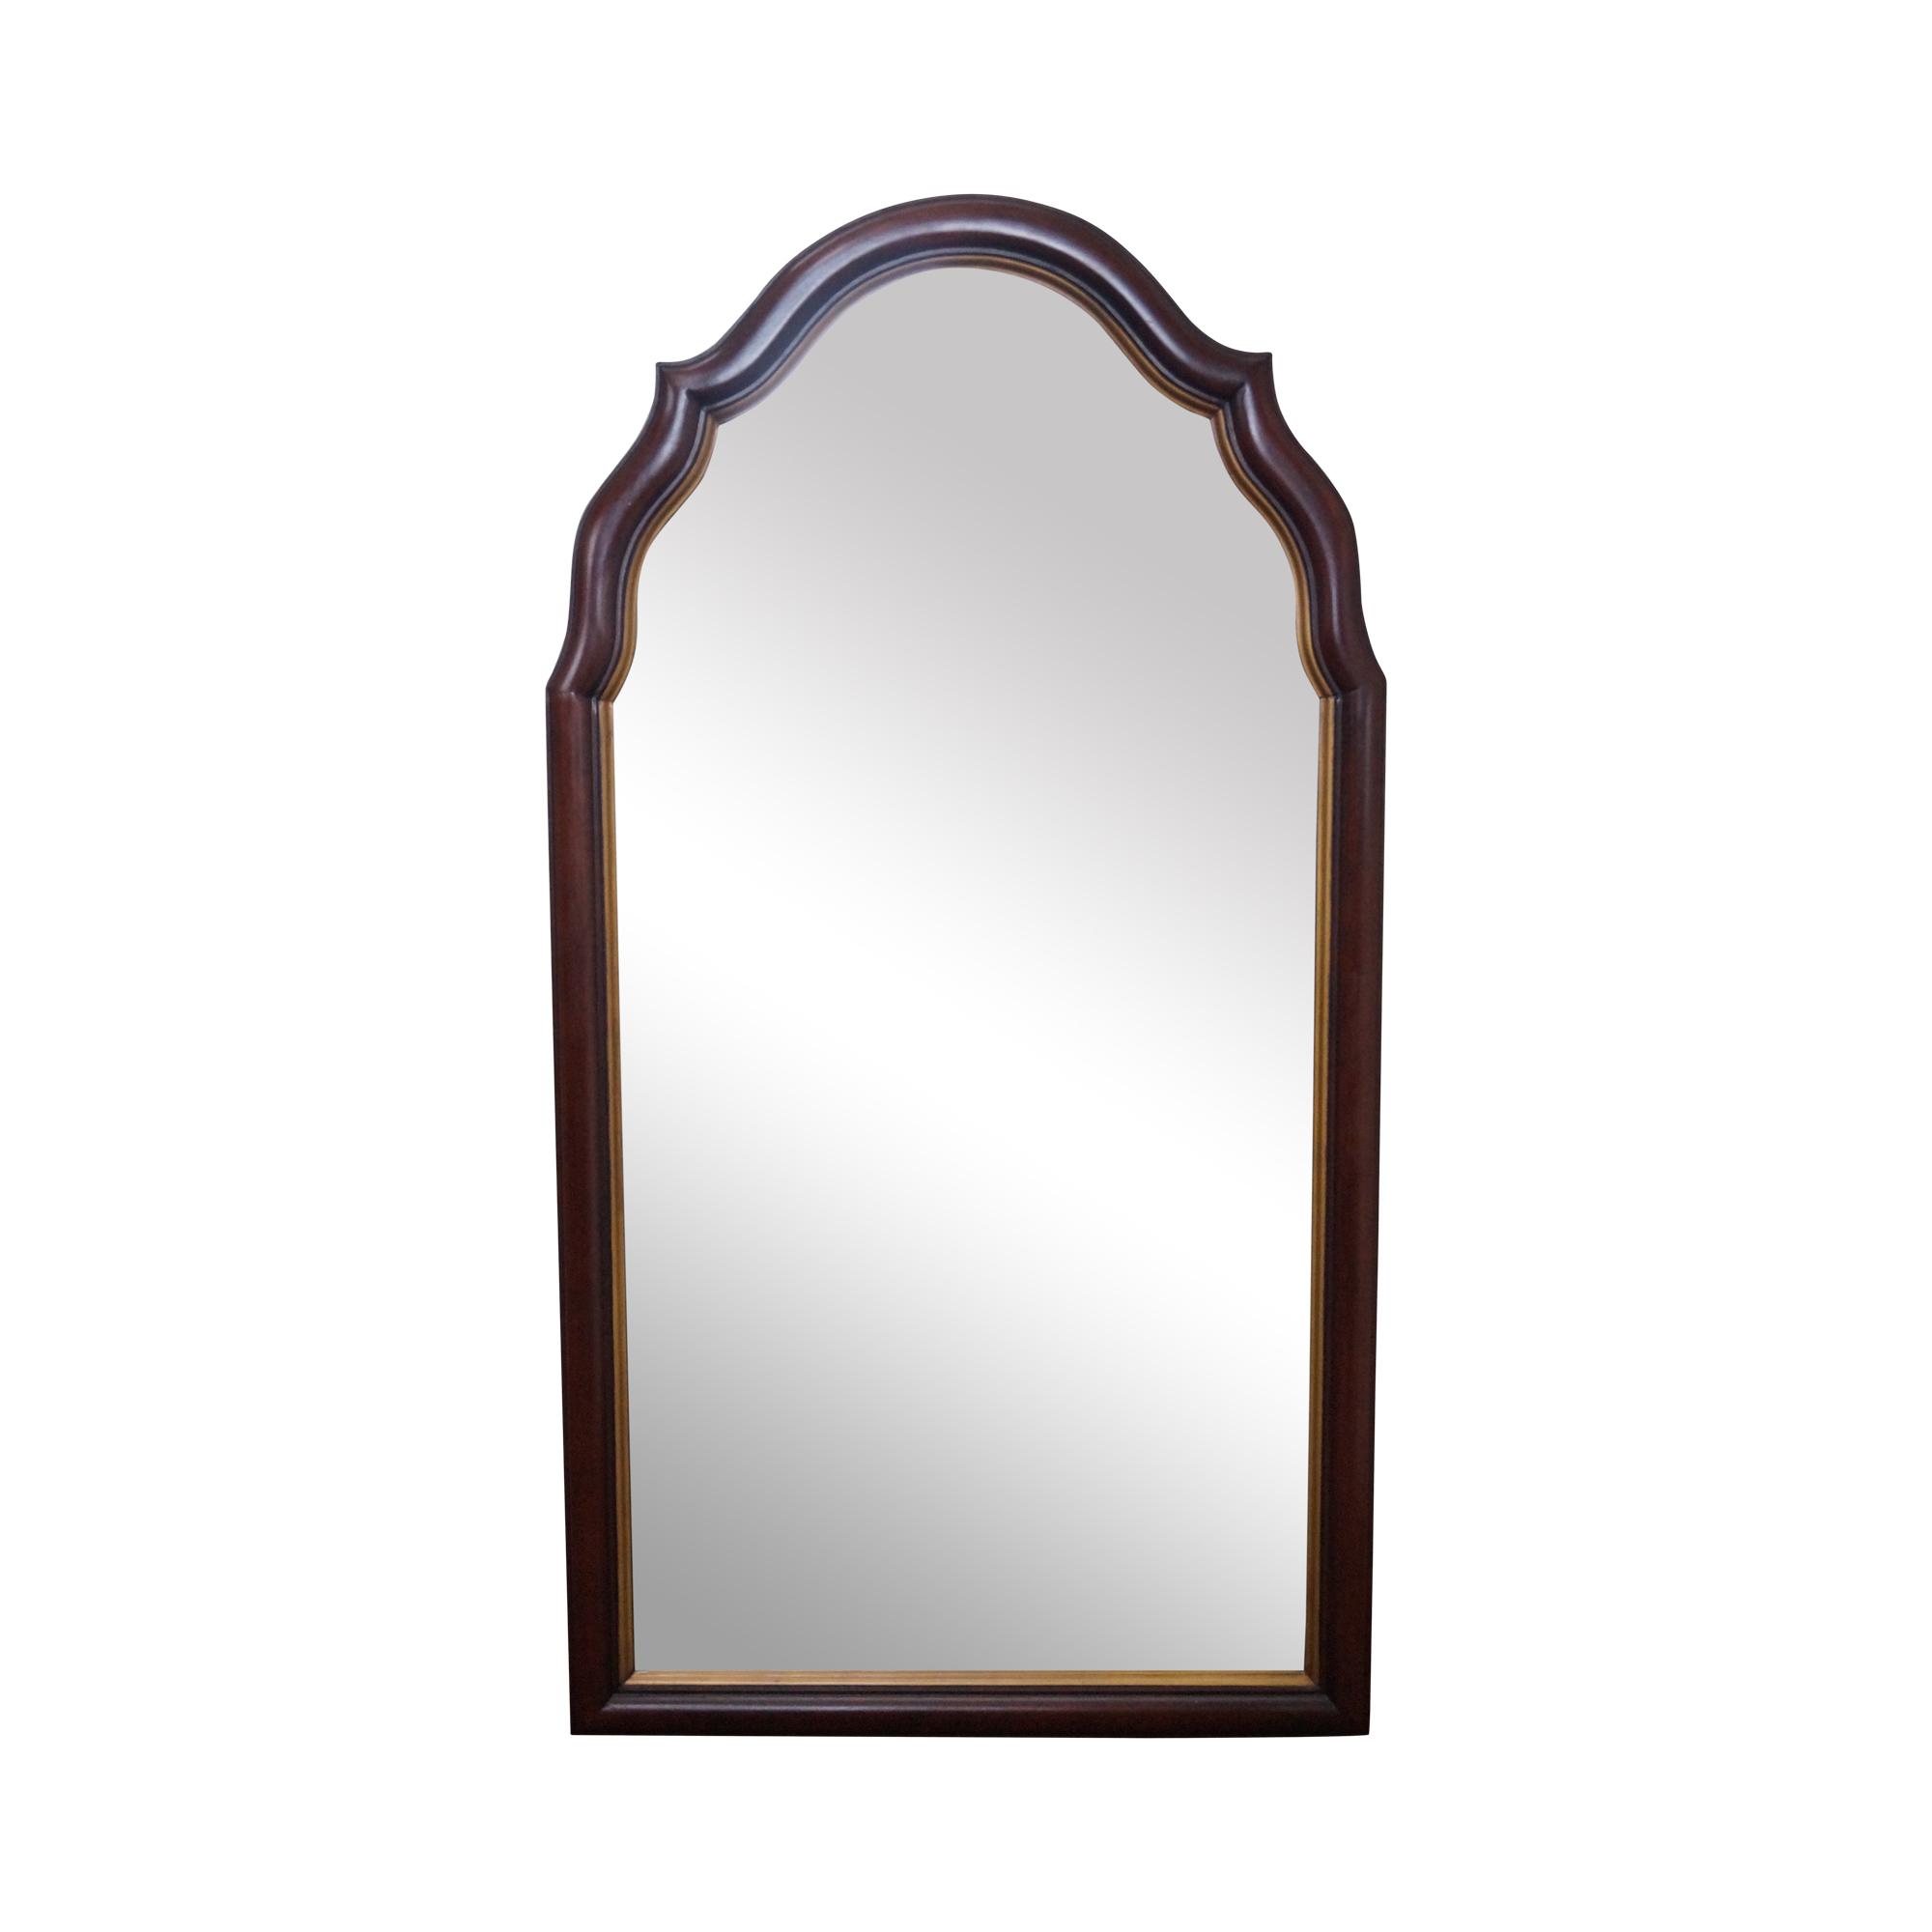 Statton Old Towne Solid Cherry Arch Top Mirror | Chairish